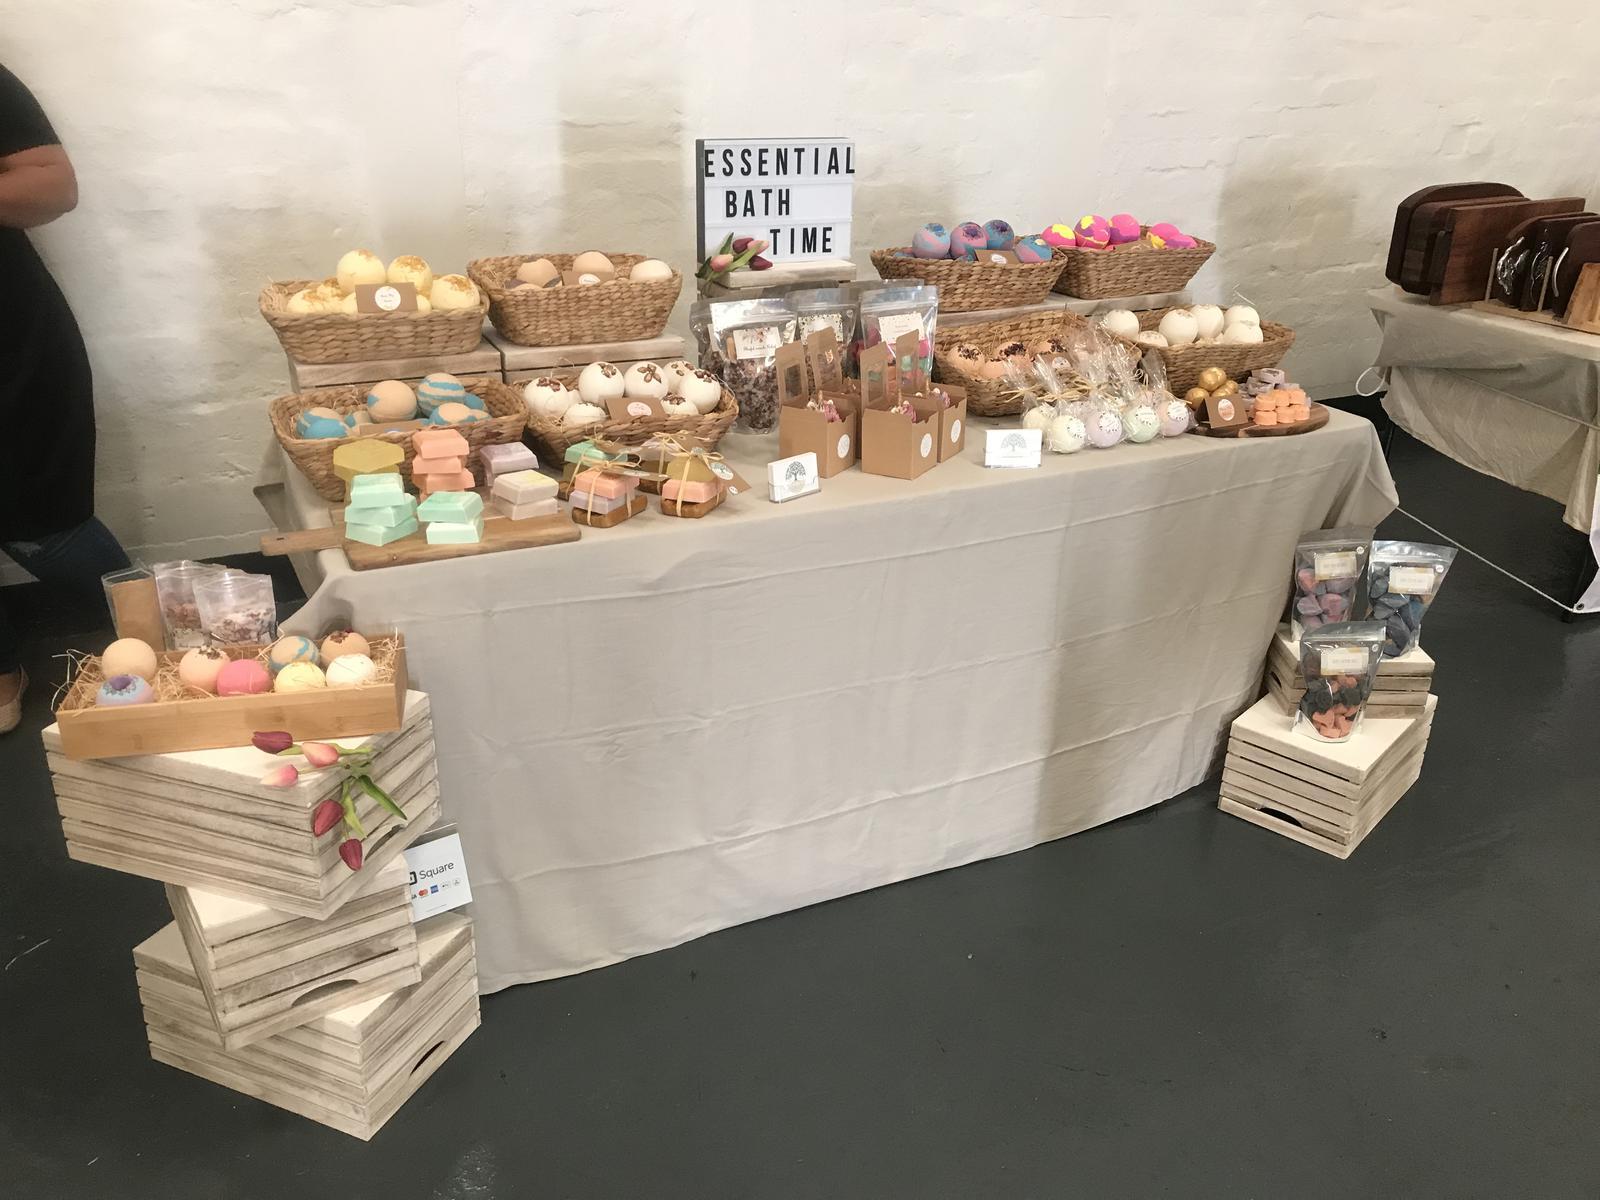 Small market set up